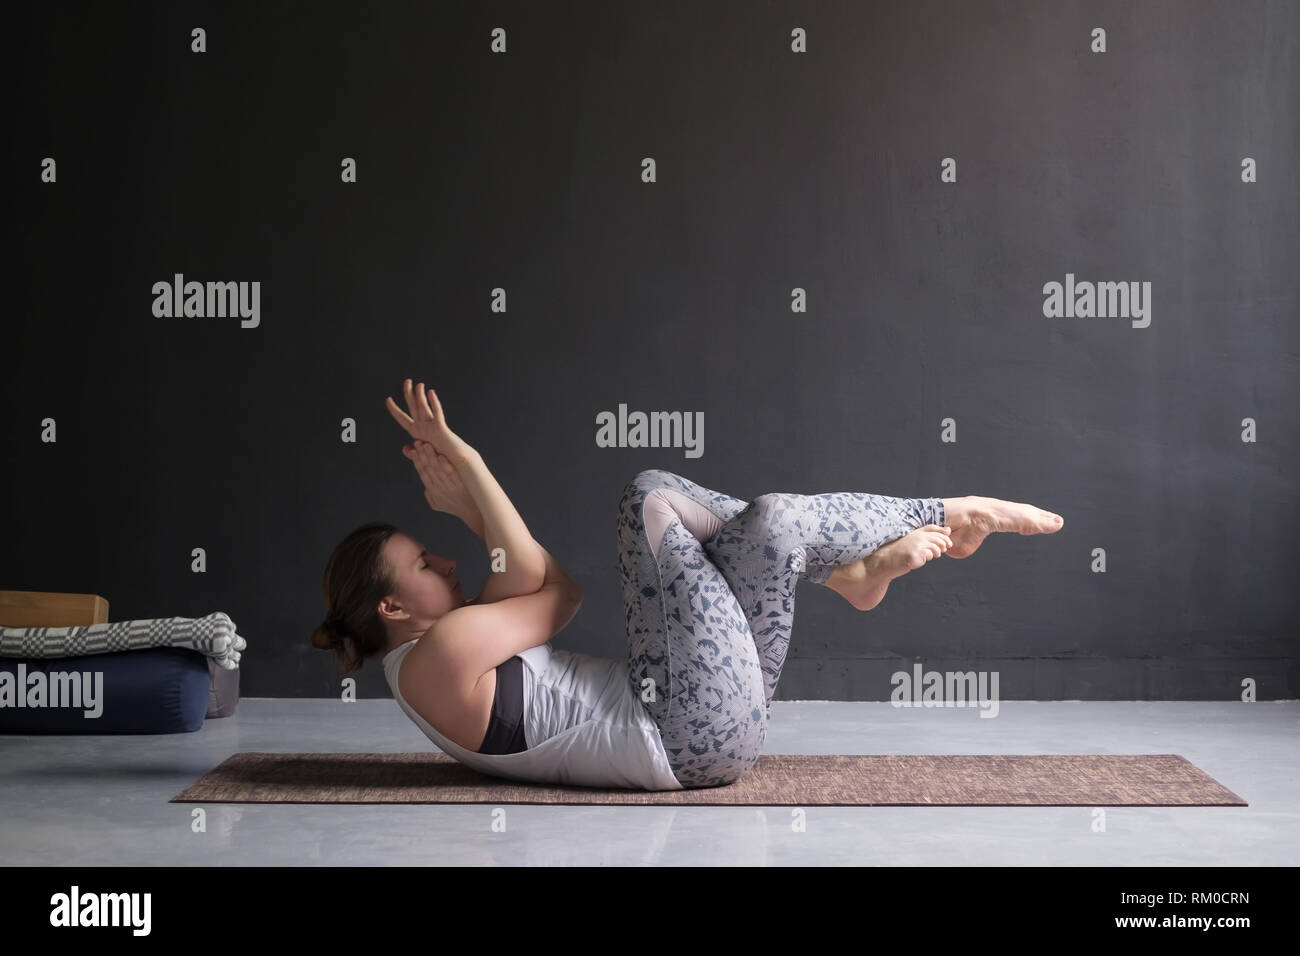 woman practicing yoga asana Ardha Navasana boat with garudasana variation - Stock Image